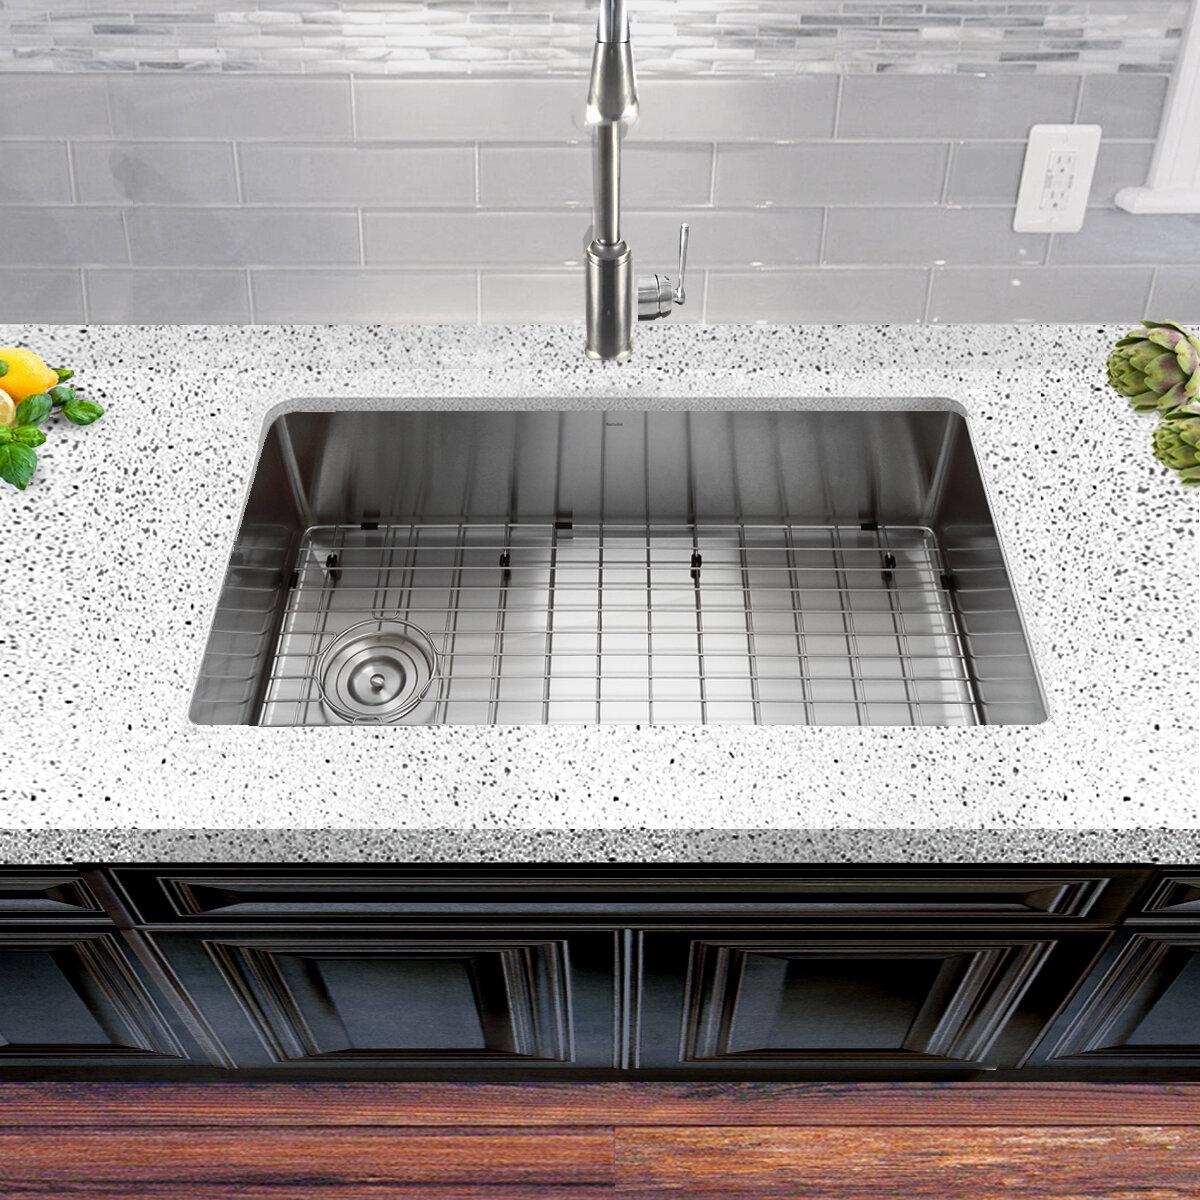 Nantucket Sinks Pro Series 32 X 18 Undermount Kitchen Sink Reviews Wayfair